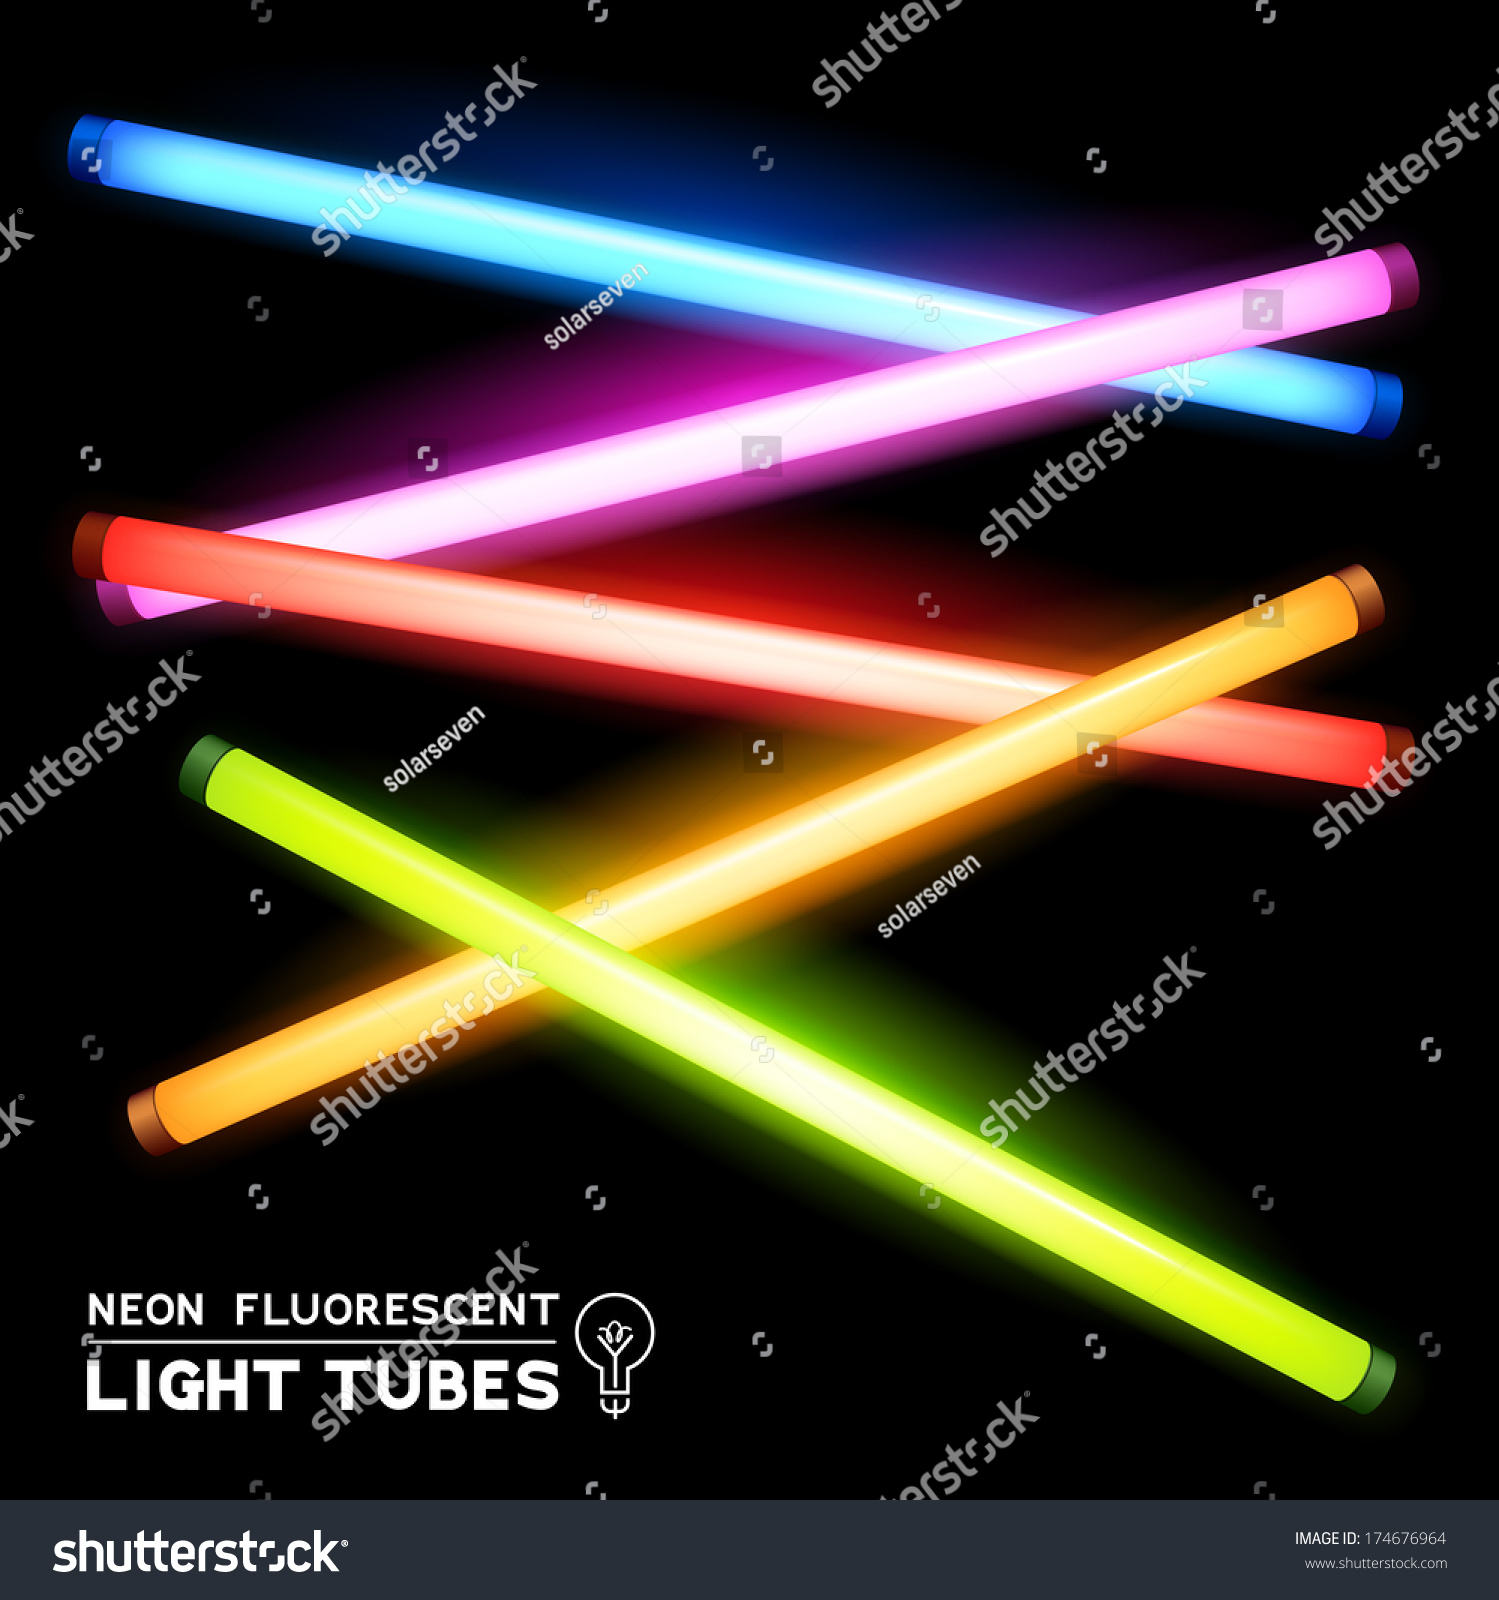 Fluorescent Light Elements: Neon Fluorescent Light Tubes Vector Light Stock Vector